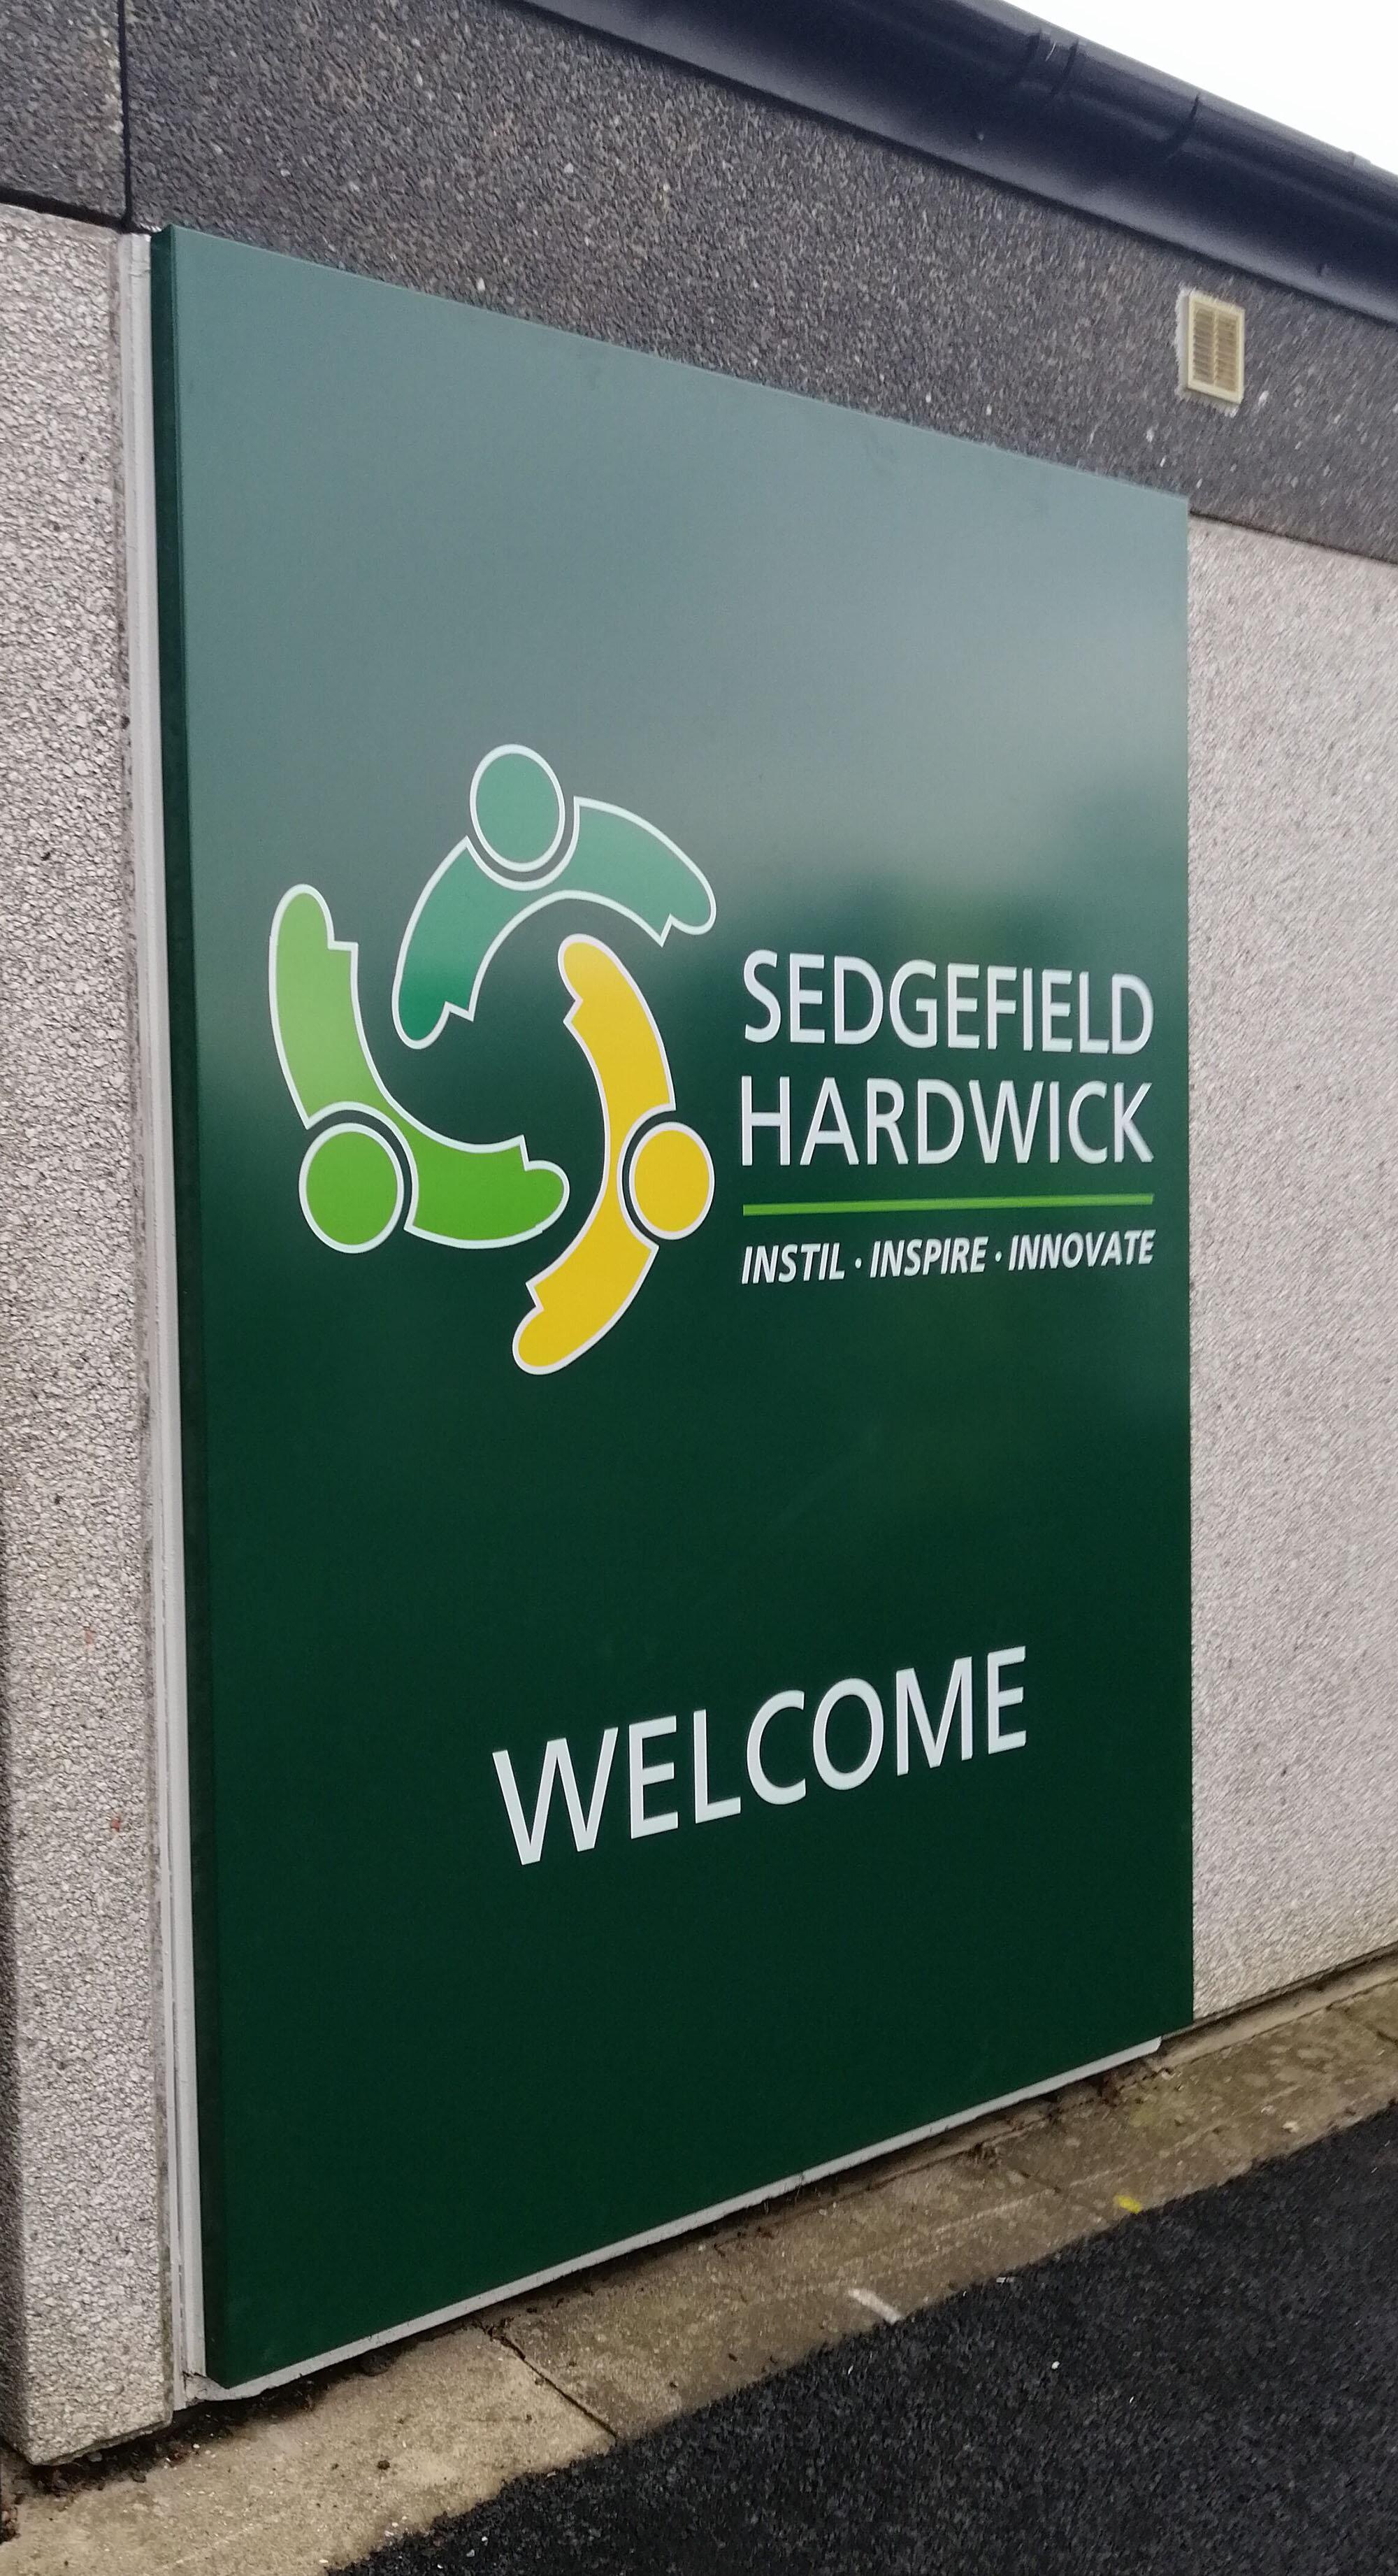 Sedgefield Hardwick